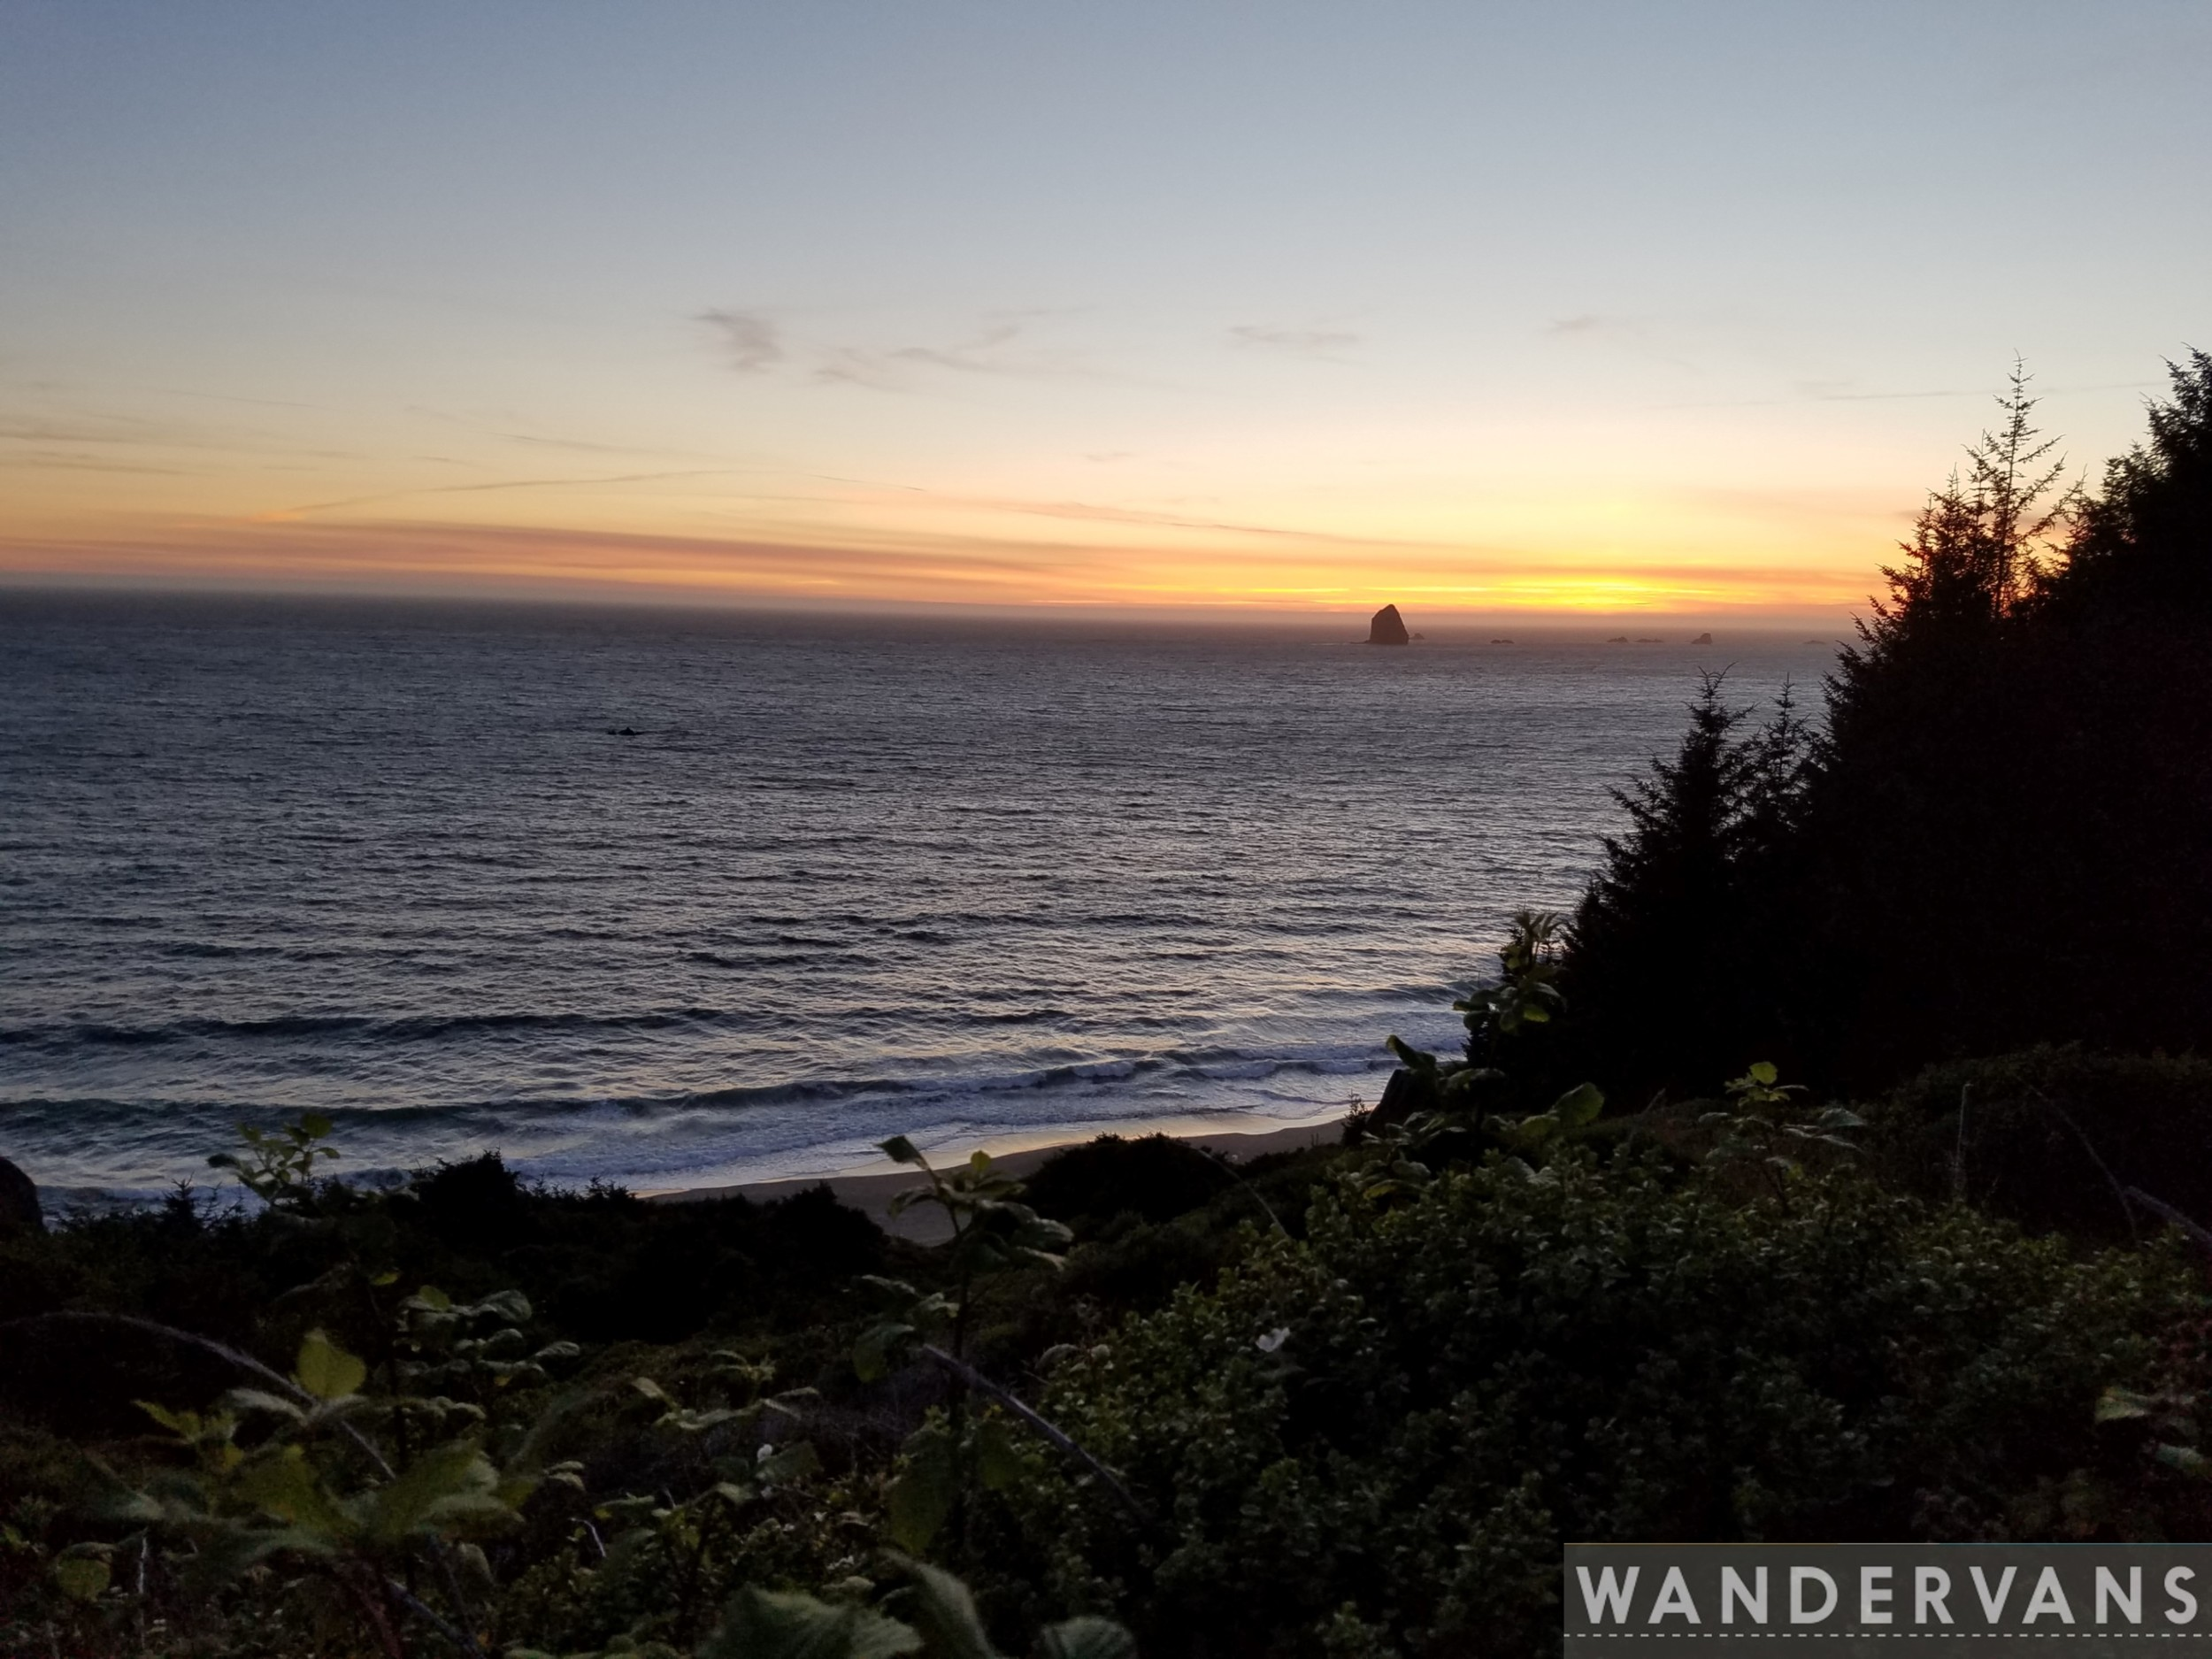 vanlife-rv-campervan-rent-idaho-sun-valley-boise-wandervans-wanderlust-skiing-backcountry-snowboard-sawtooth-biking-hiking-outsidevan-redwoods-oregon-coast